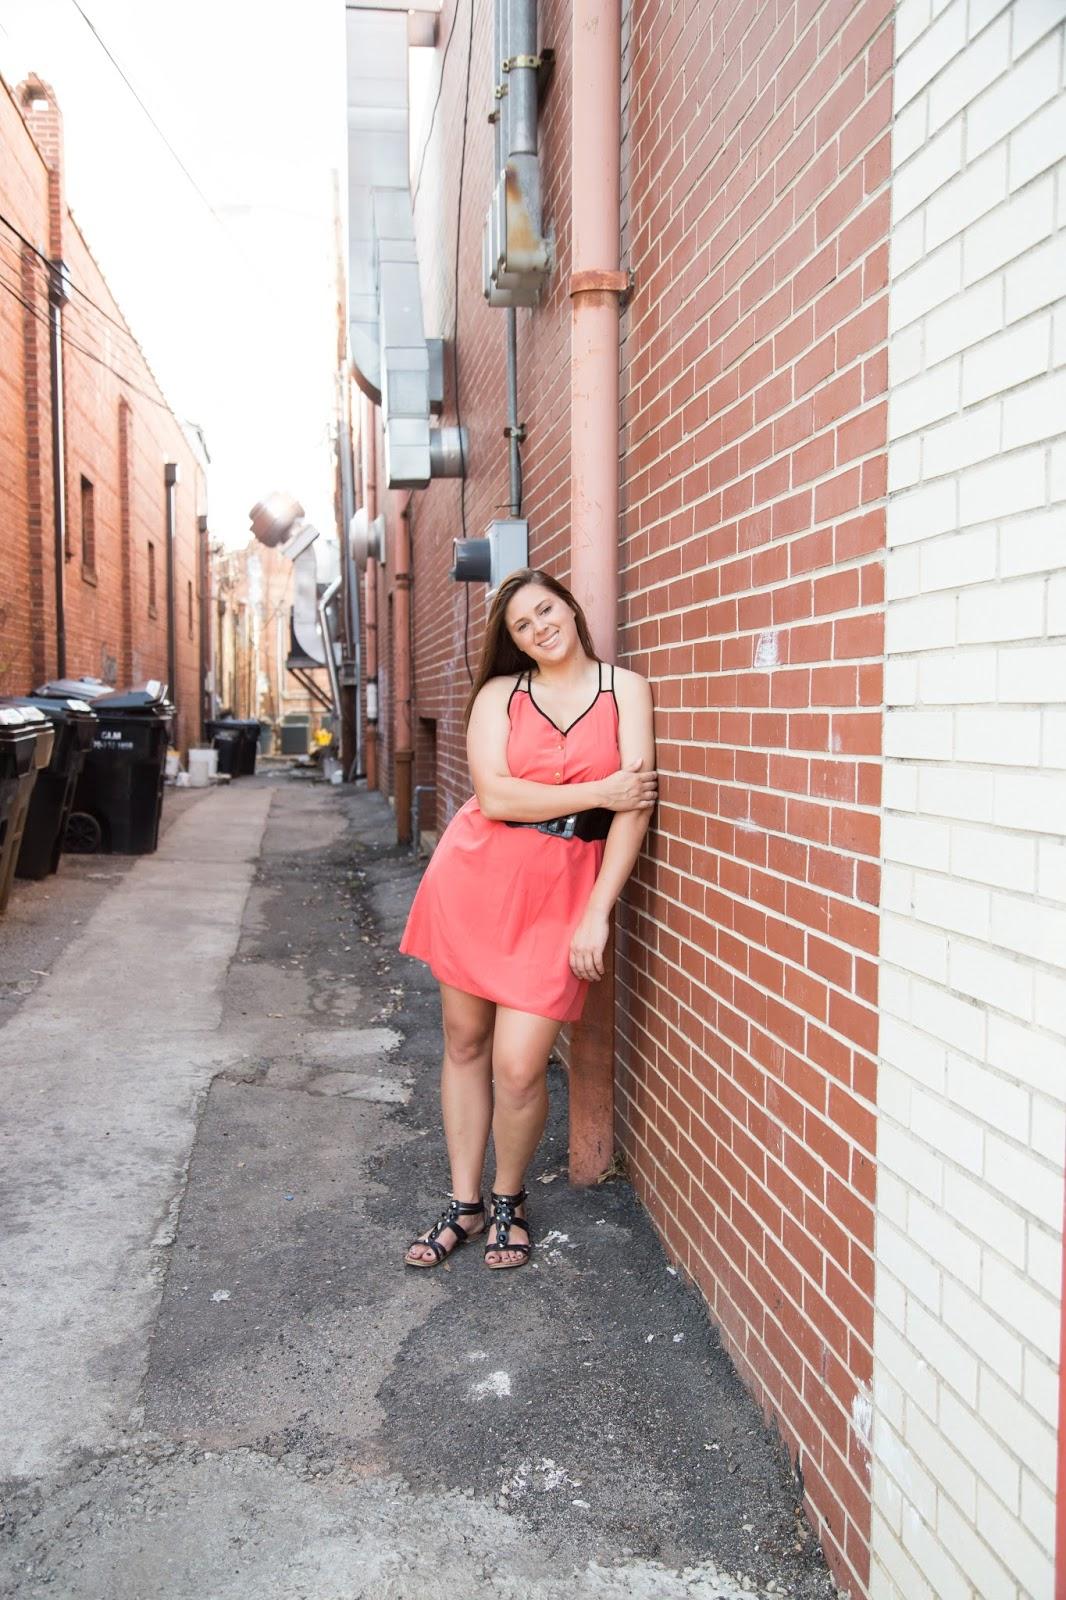 baylee+blog-16.jpg